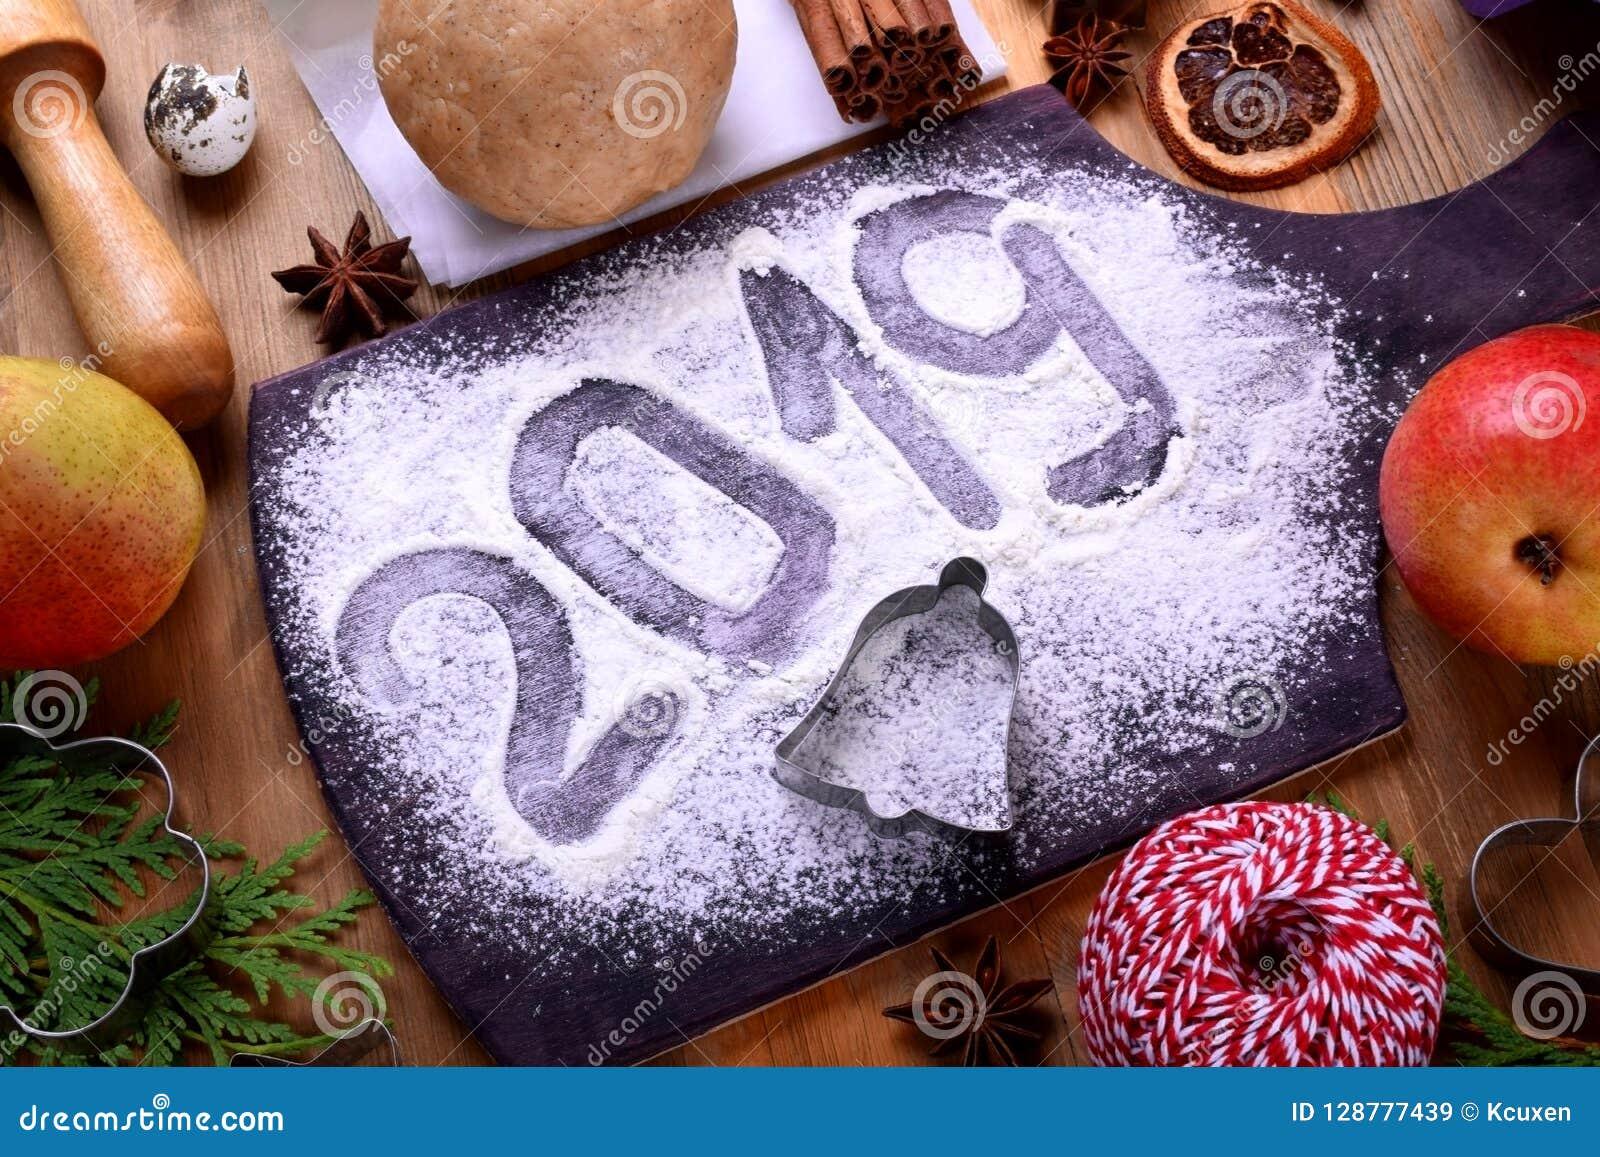 Christmas Cookie Recipes 2019.2019 Inscription On A Flour Sprinkled Board Christmas